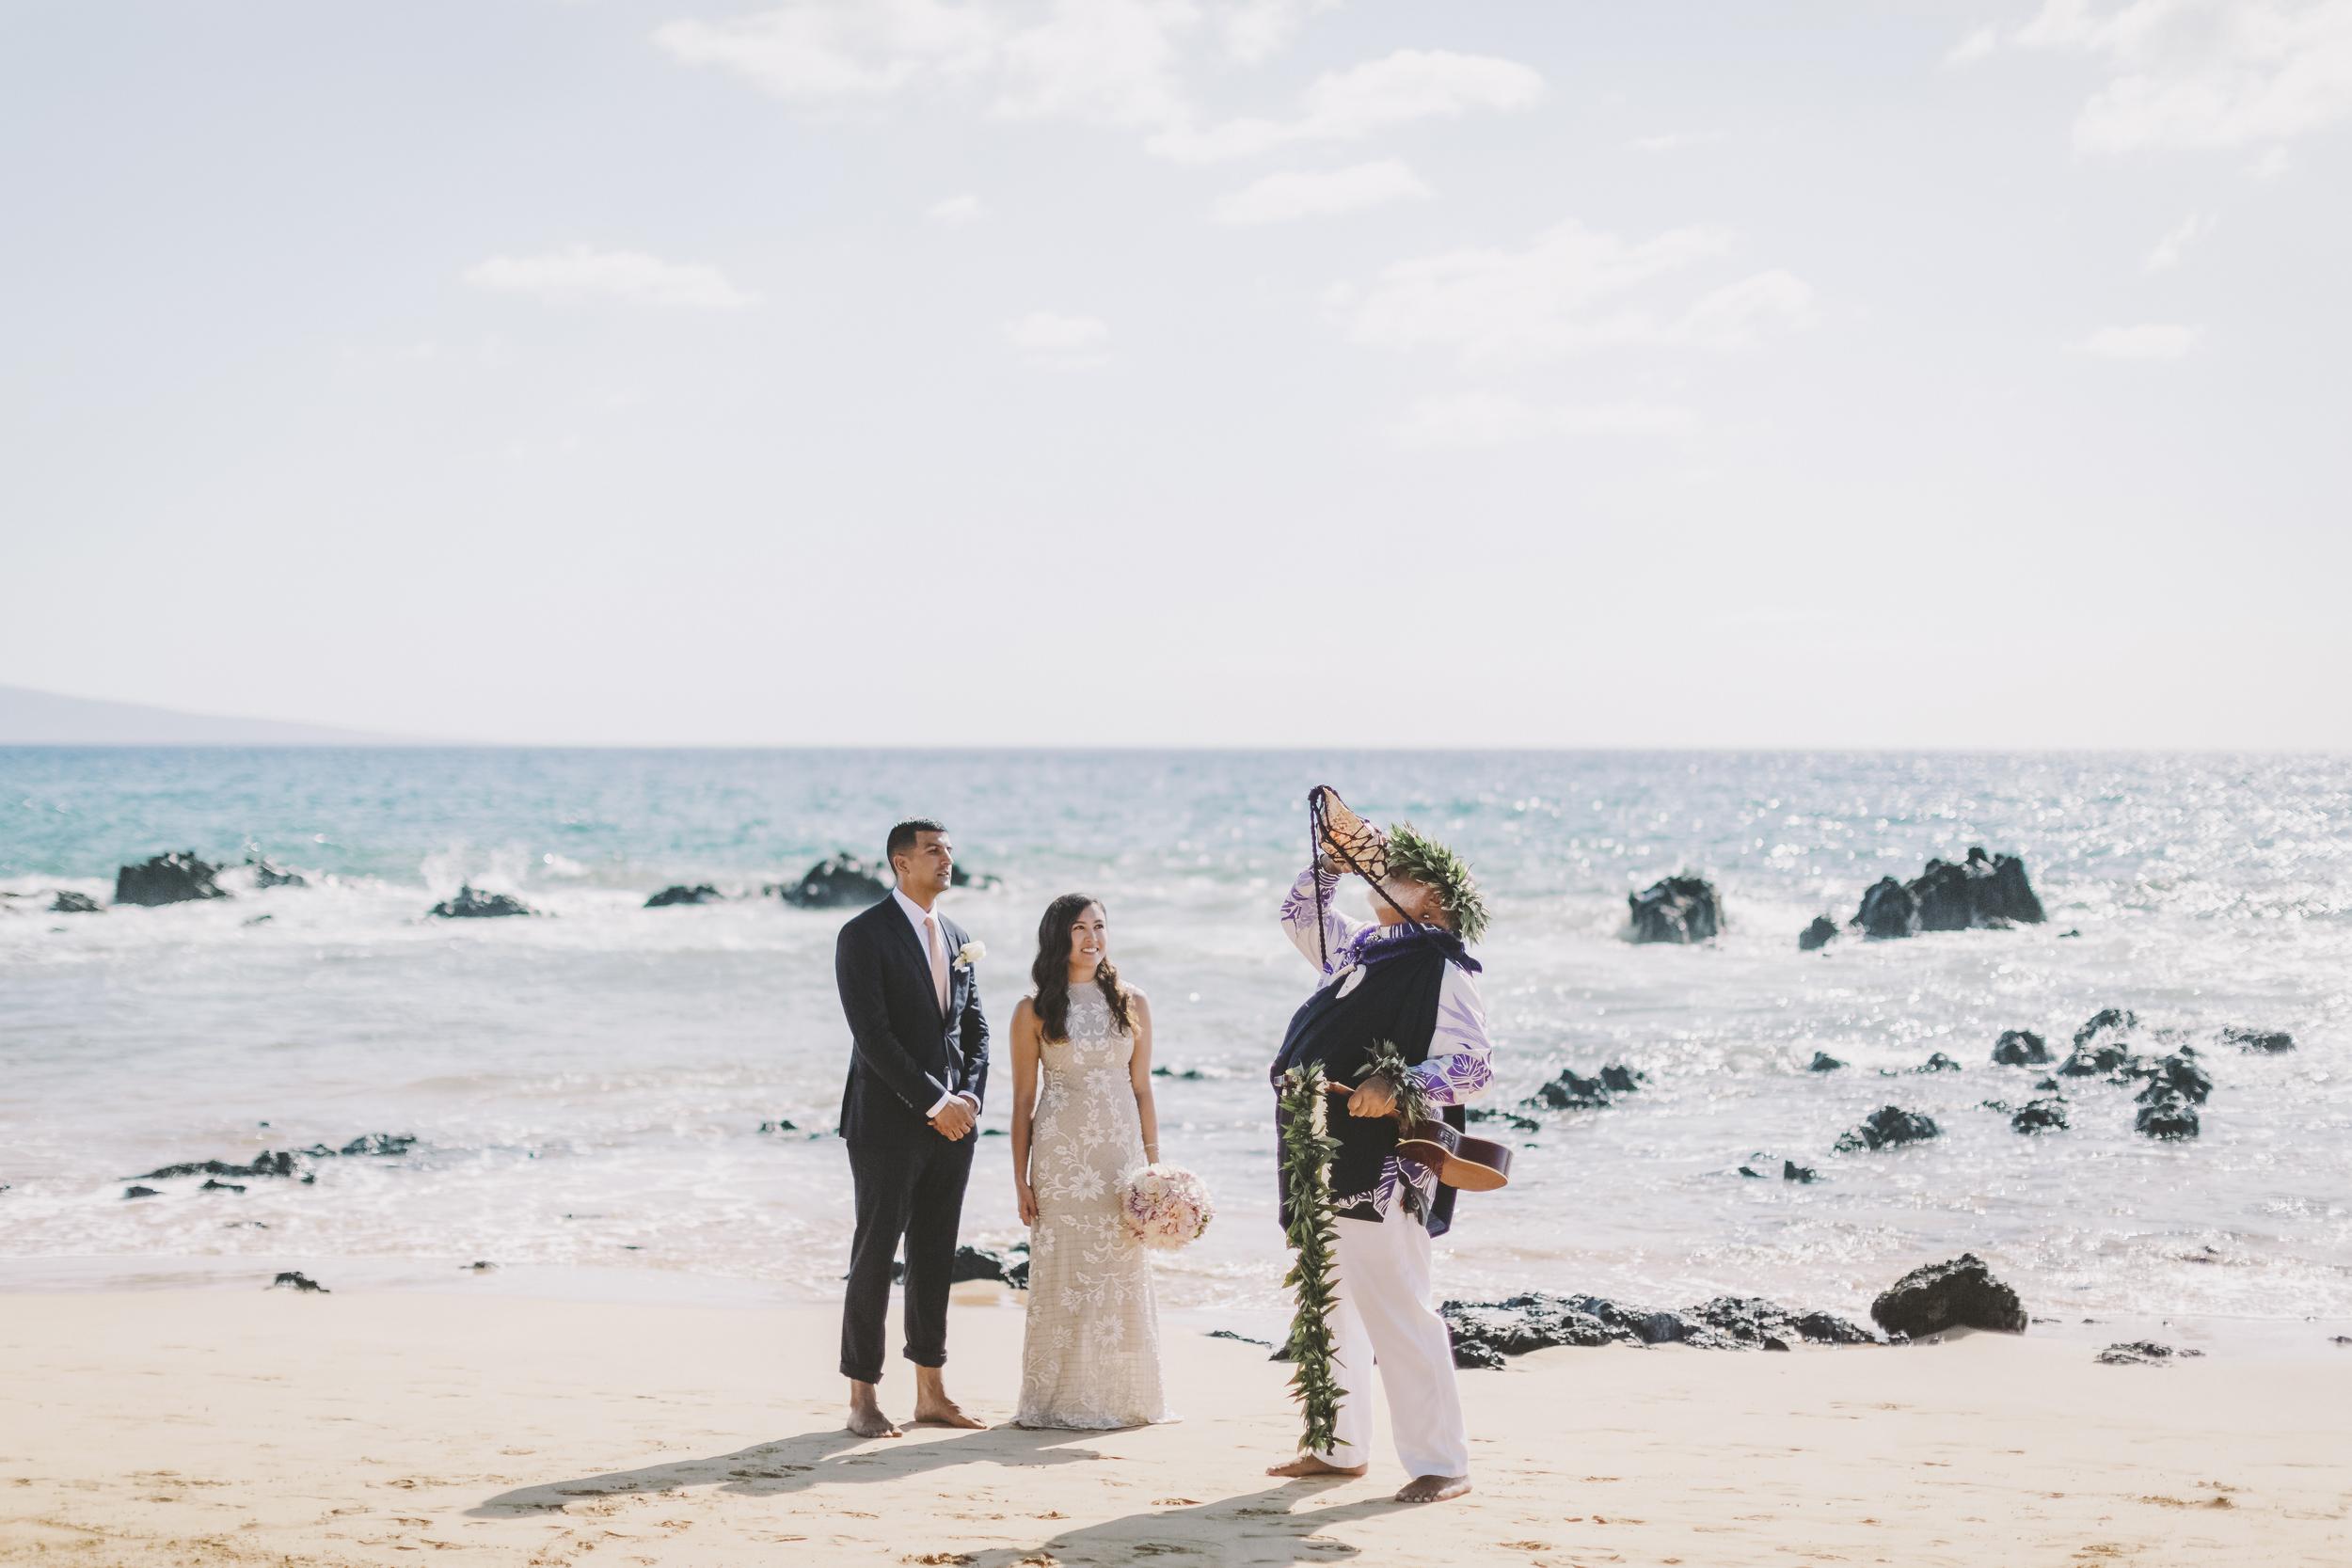 angie-diaz-photography-mokapu-beach-maui-elopement-21.jpg